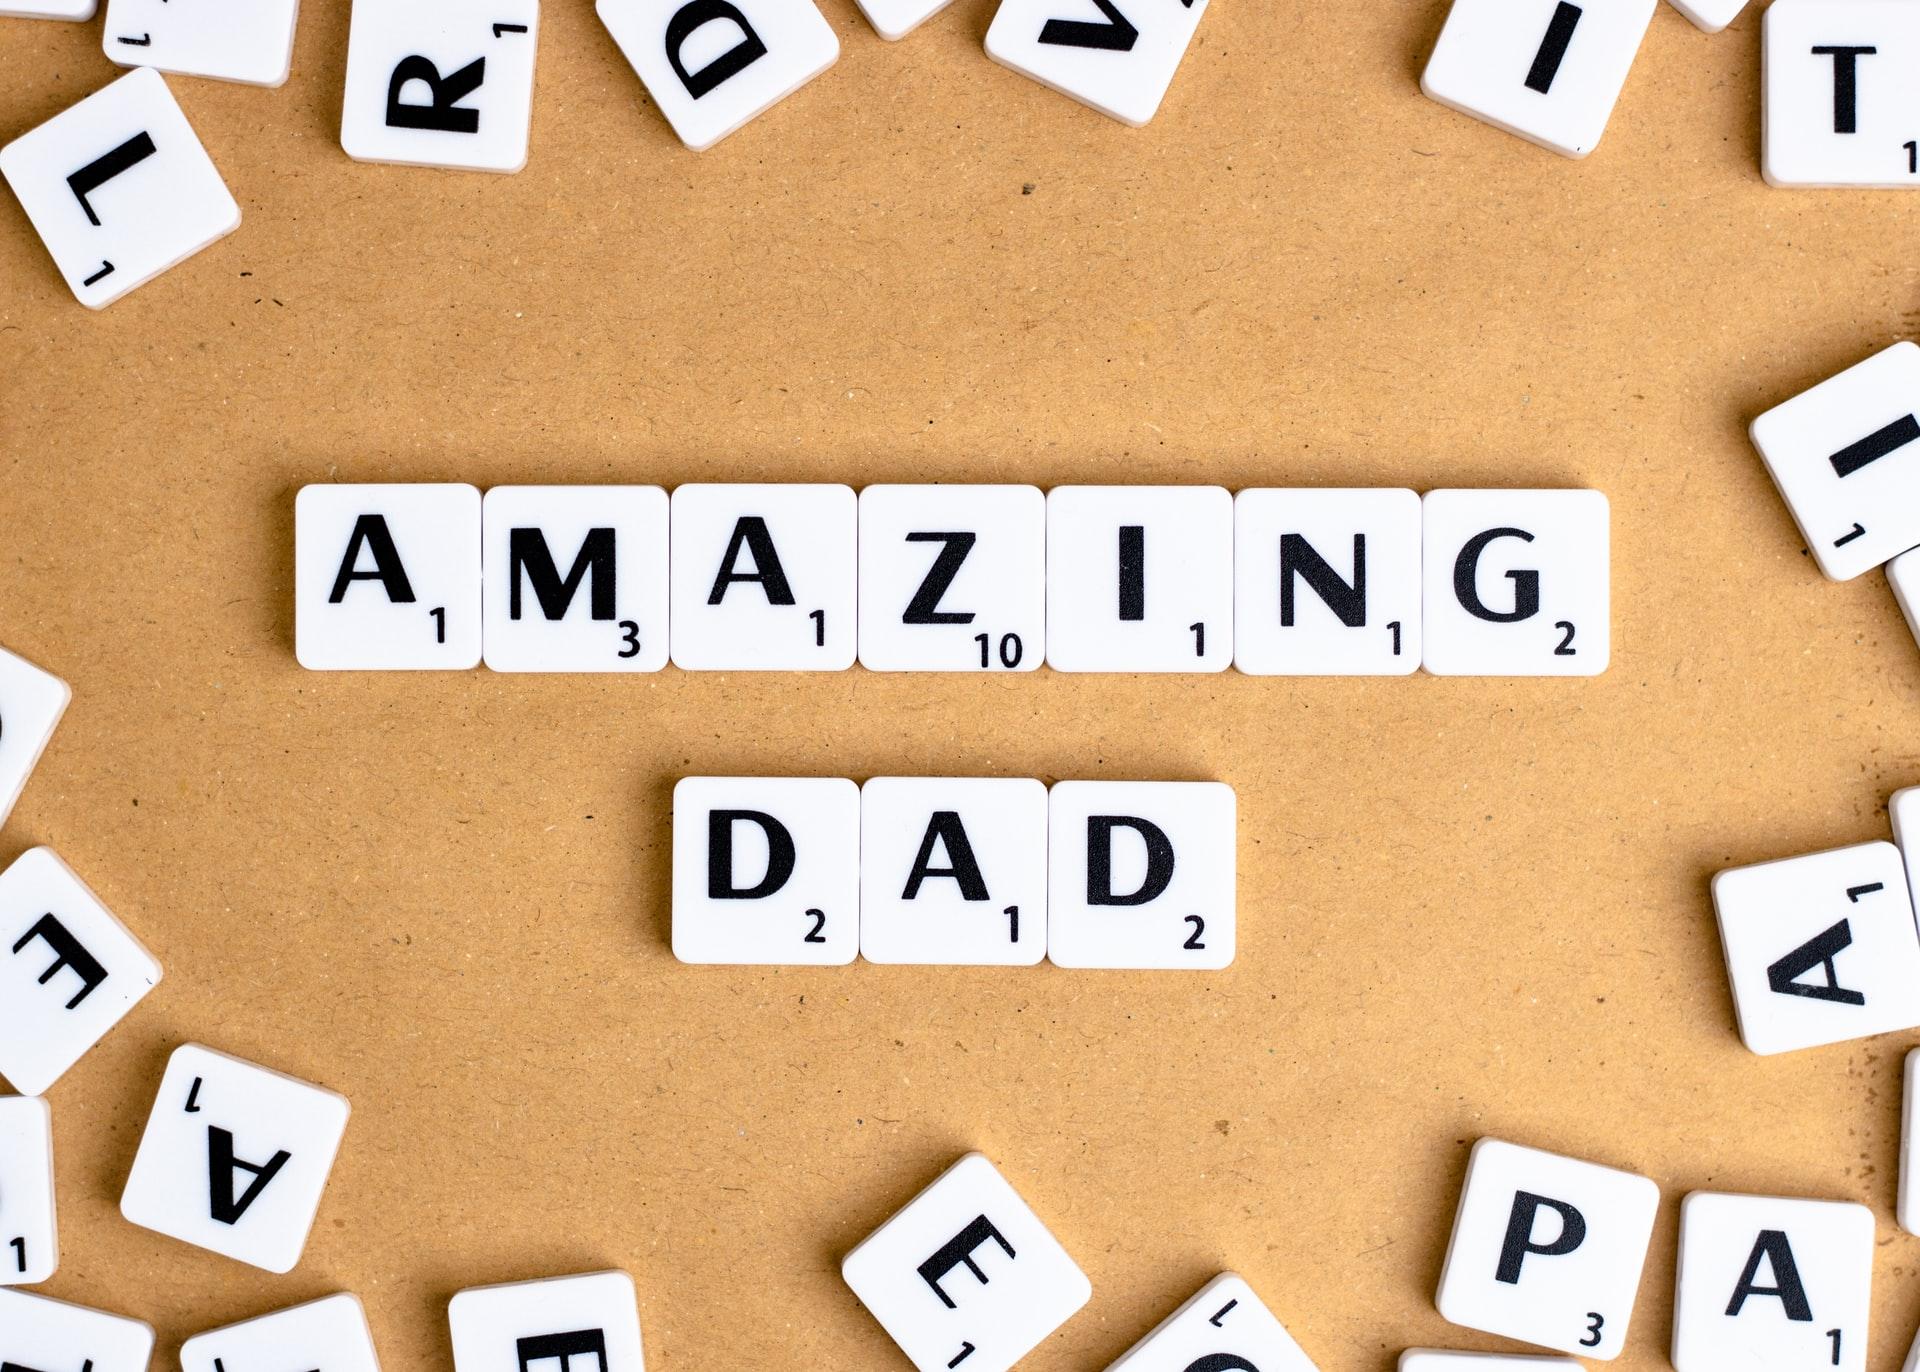 Main Image: True Fatherhood in Action